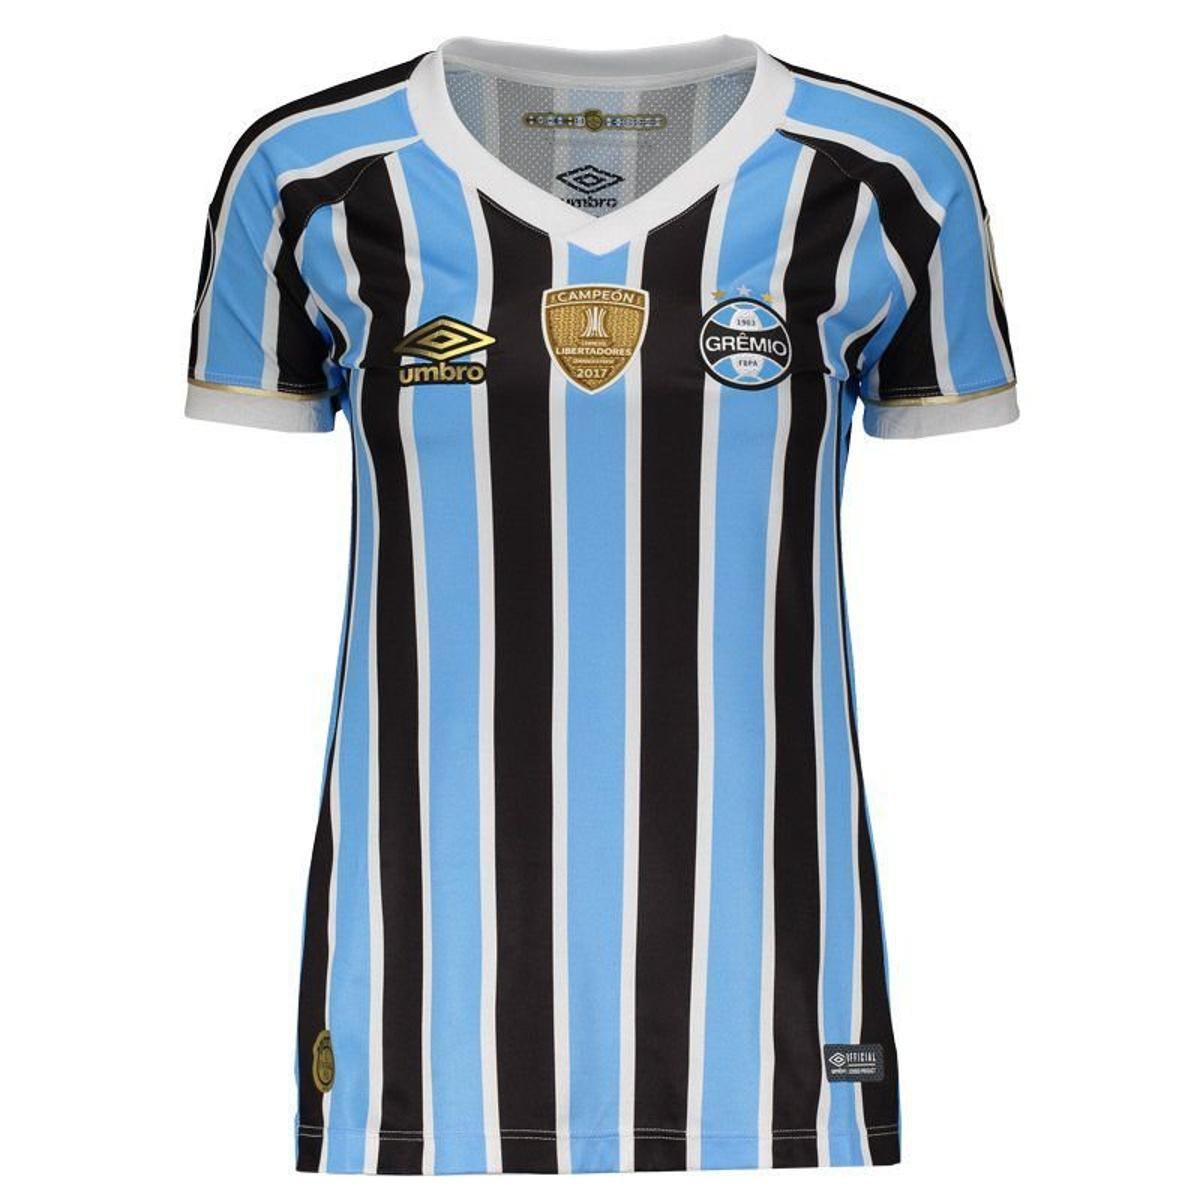 89d3d7b6b2432 Camisa Umbro Grêmio I 2018 Libertadores Feminina - Compre Agora ...